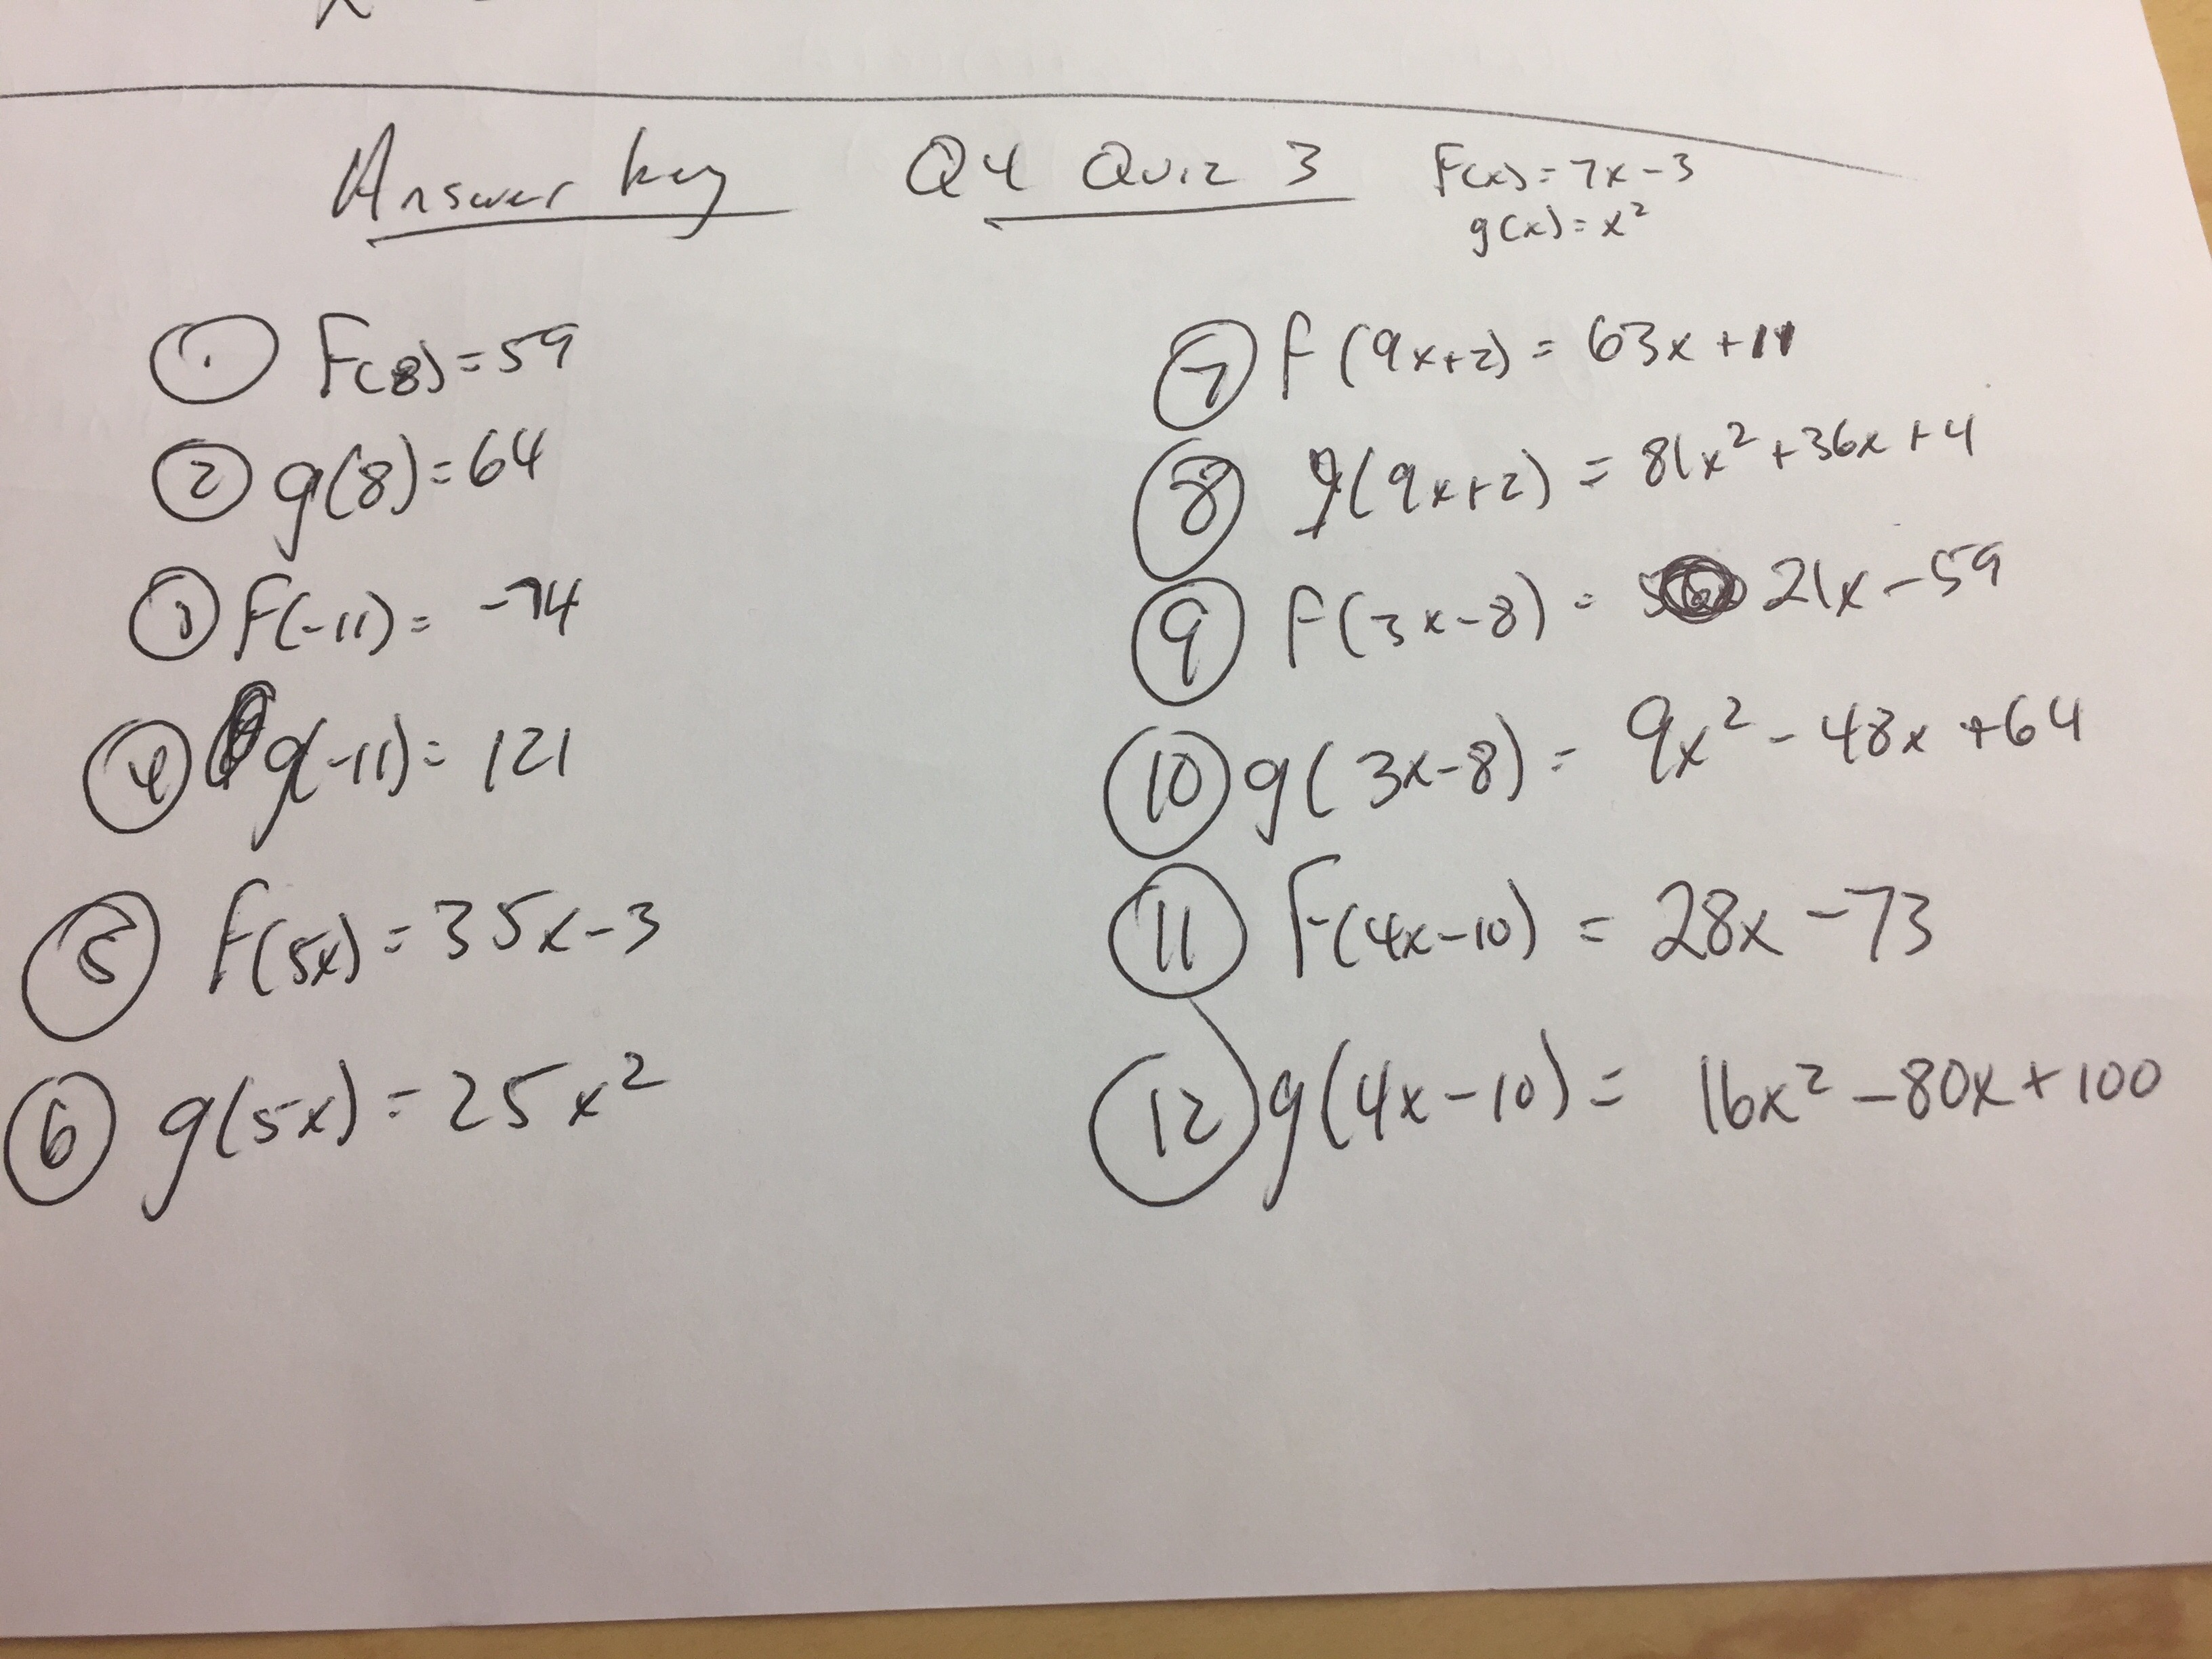 worksheet Law Of Cosines Worksheet Doc www sfponline org uploads76 8142017 530 pm 23552 alg2a q4 quiz 3 review mult with radicals 2013 doc 67219 4